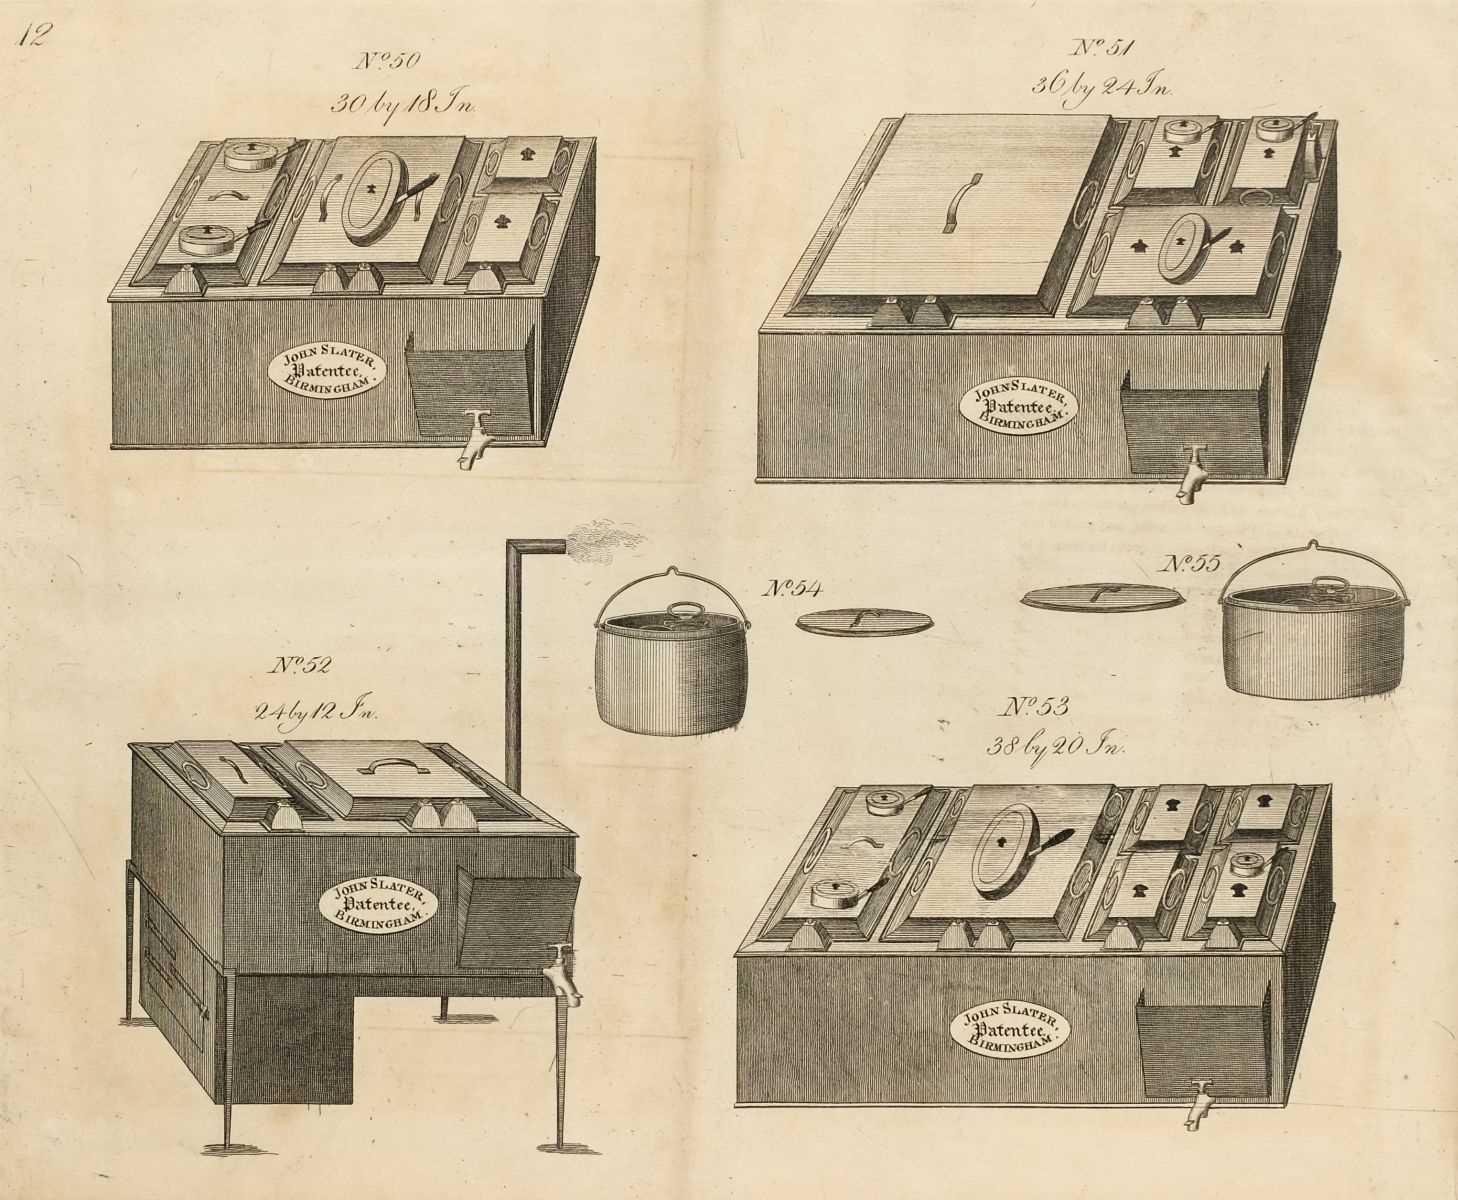 Lot 356 - Trade Catalogue. John Slater, Coach Spring & Patent Steam Kitchen Manufacturer, circa 1819